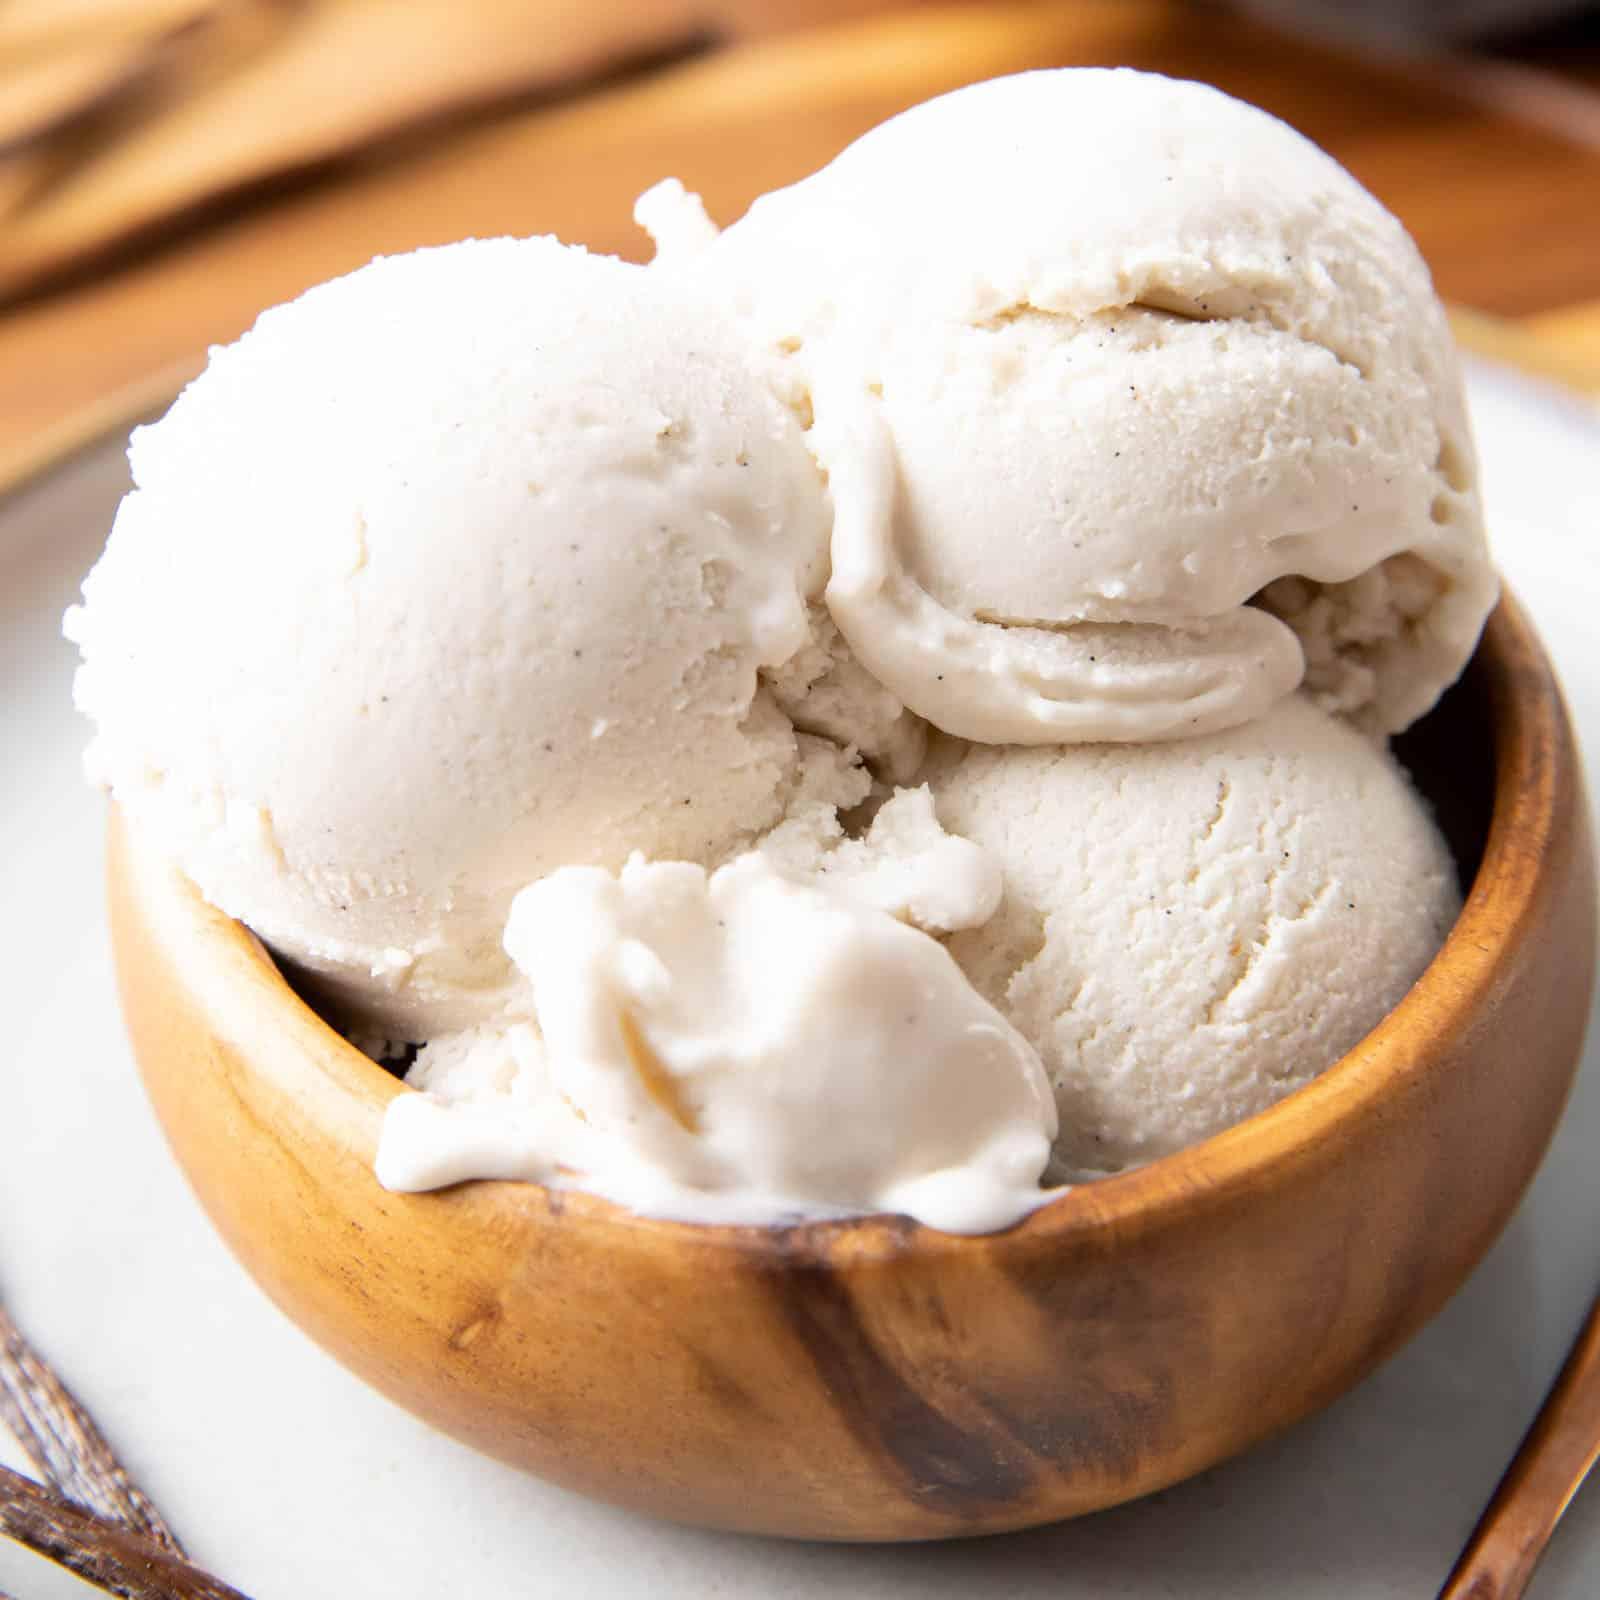 Secretly Keto Ice Cream Recipes: the best keto ice cream recipes that you won't possibly believe are keto + low carb. Serve these secretly keto ice cream recipes and shock people! Chocolate keto ice cream, vanilla keto ice cream, and more. #Keto #IceCream #KetoIceCream #LowCarb | Recipes at BeamingBaker.com